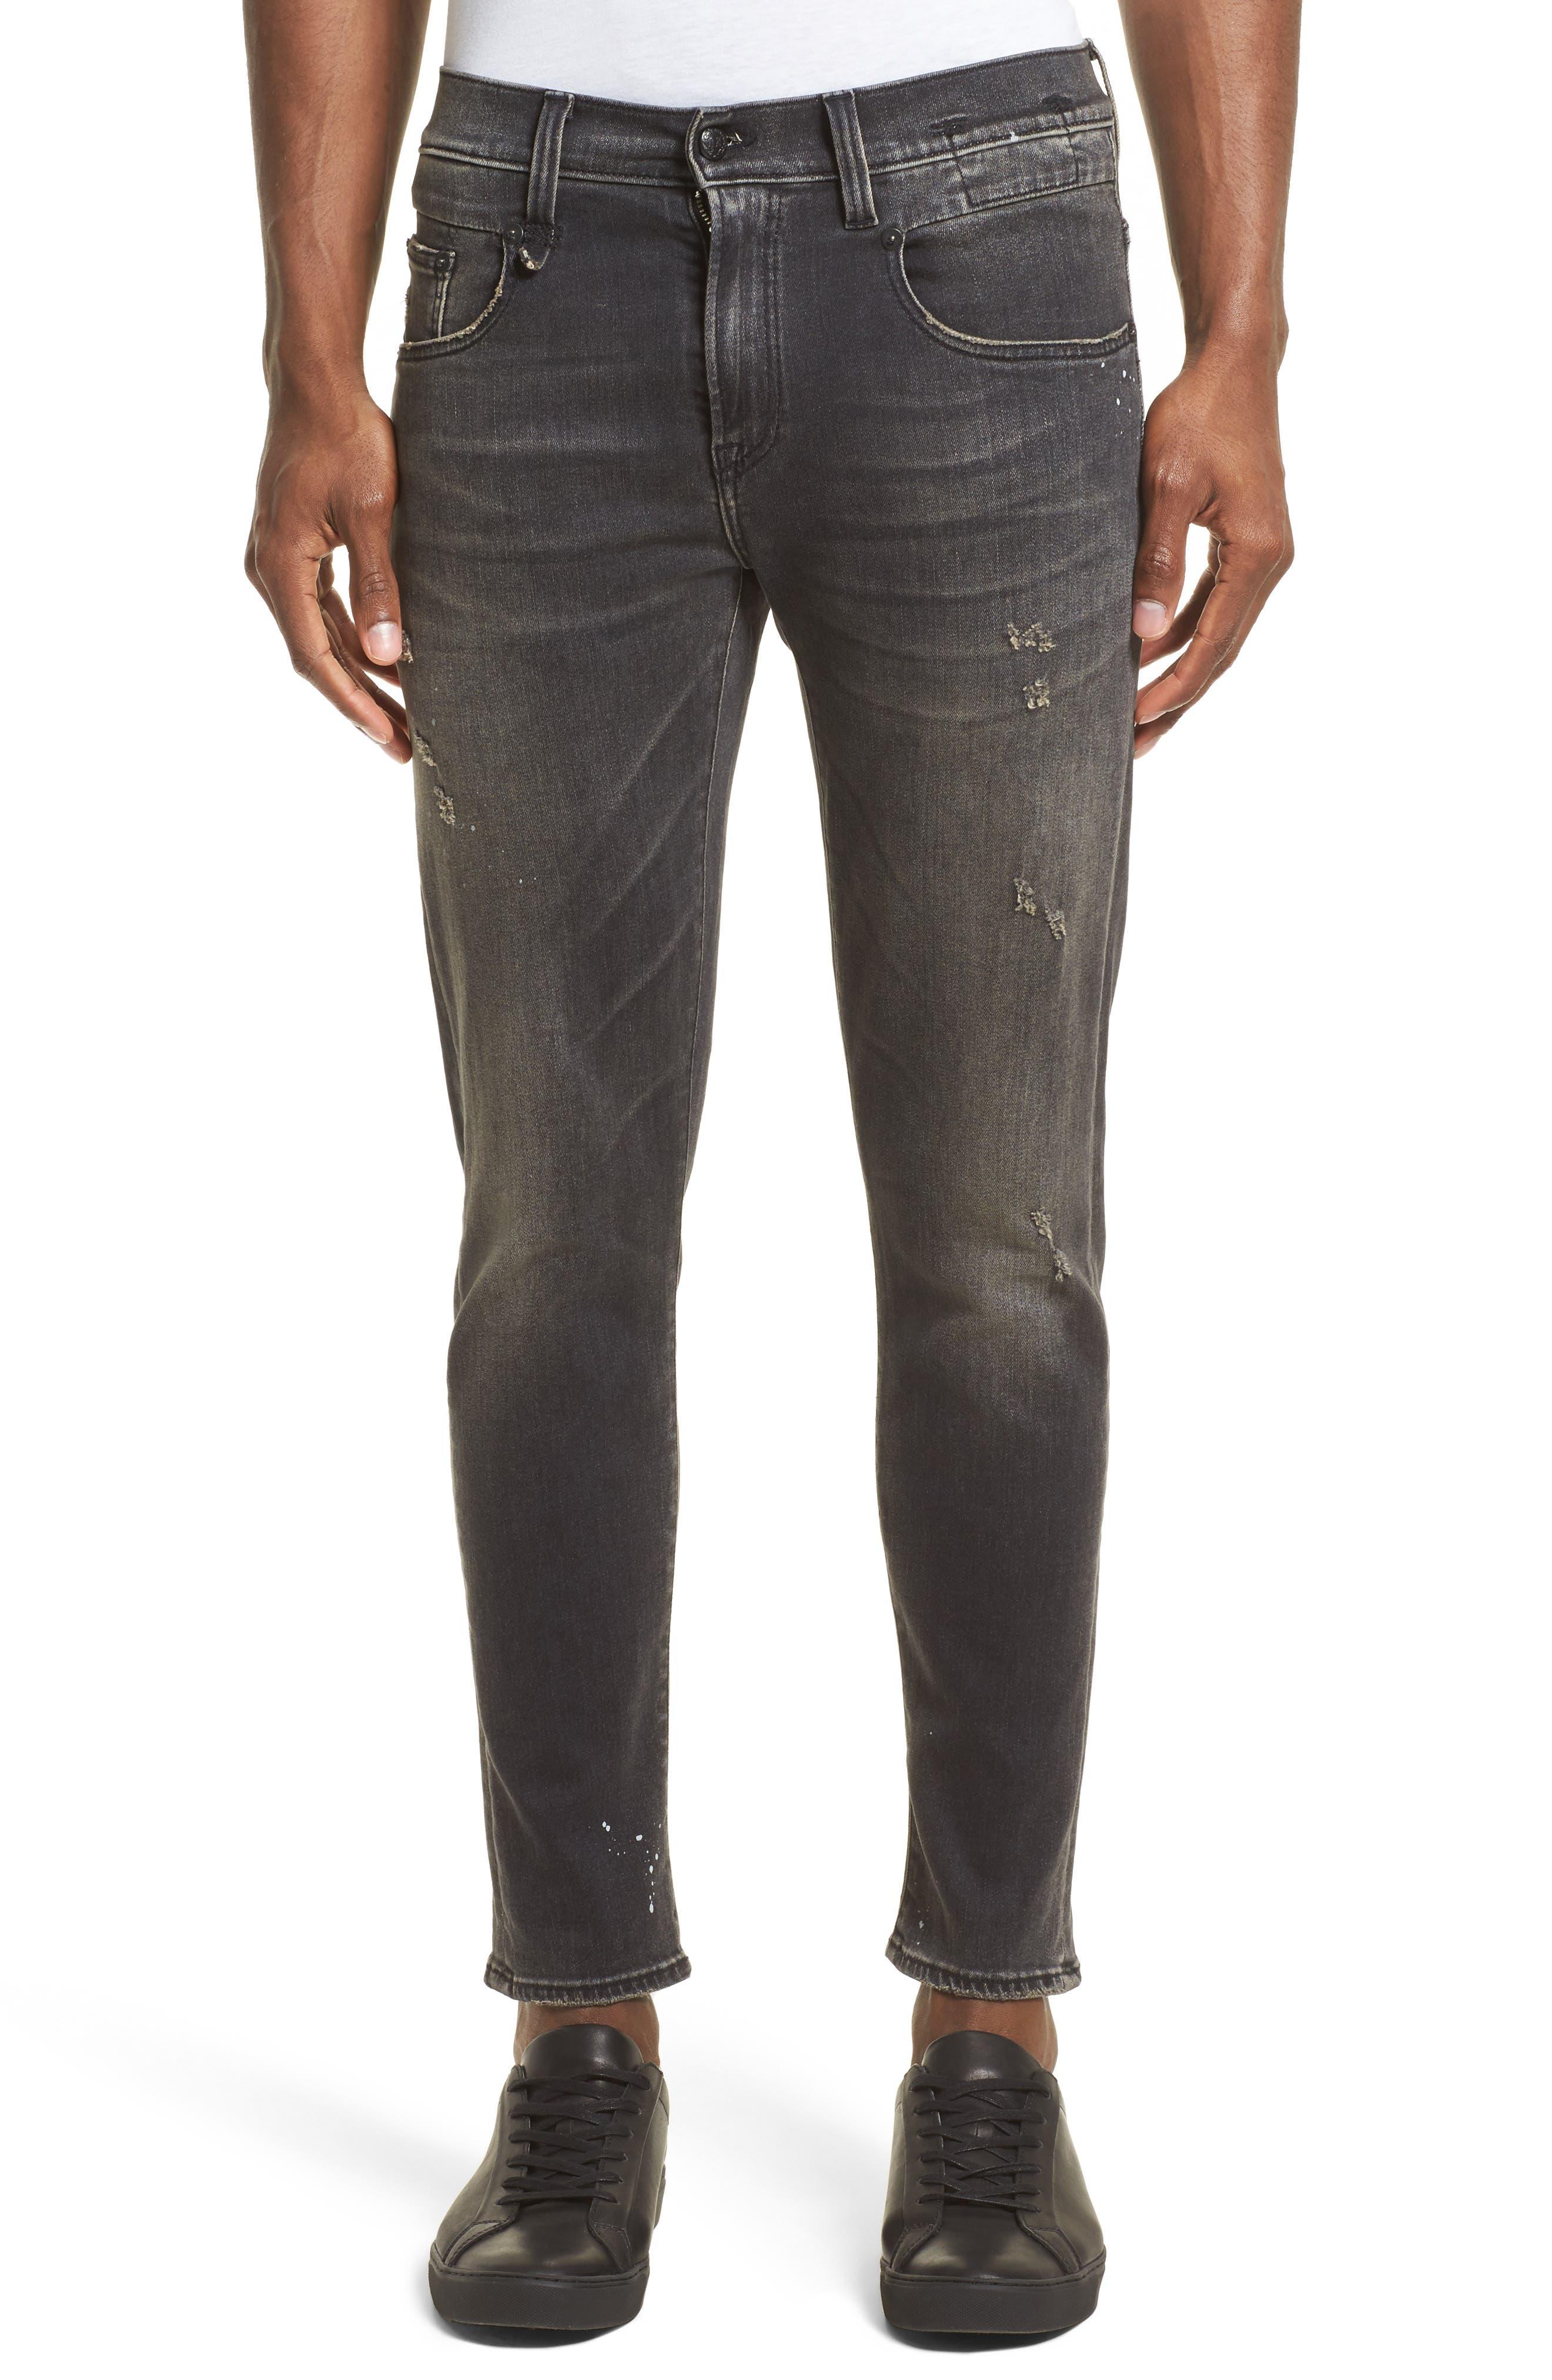 R13 Boy Paint Splattered Jeans (Black)